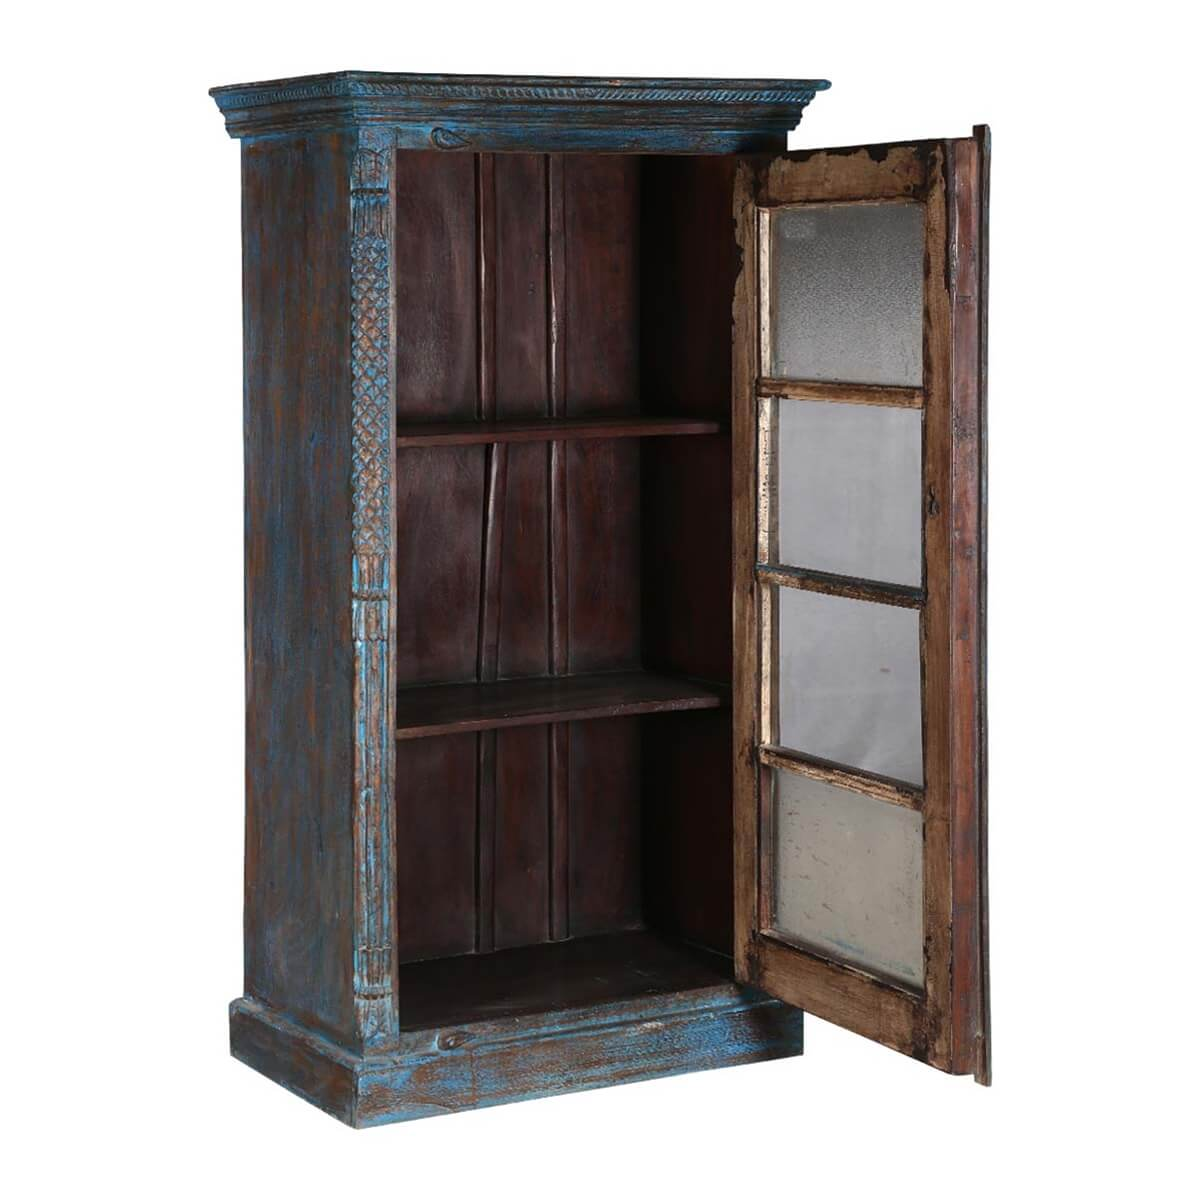 Midnight distressed blue mango wood glass door curio